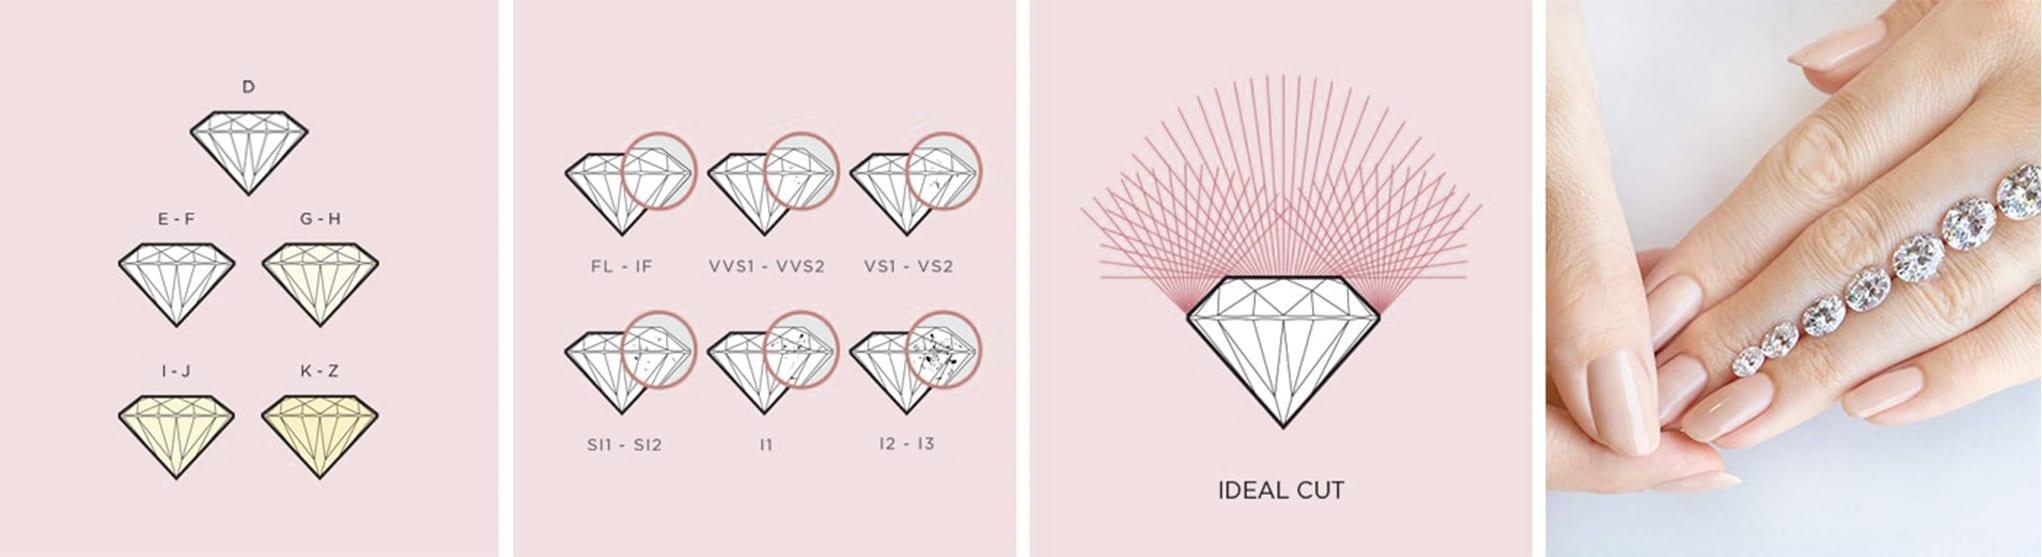 4Cs of diamond quality